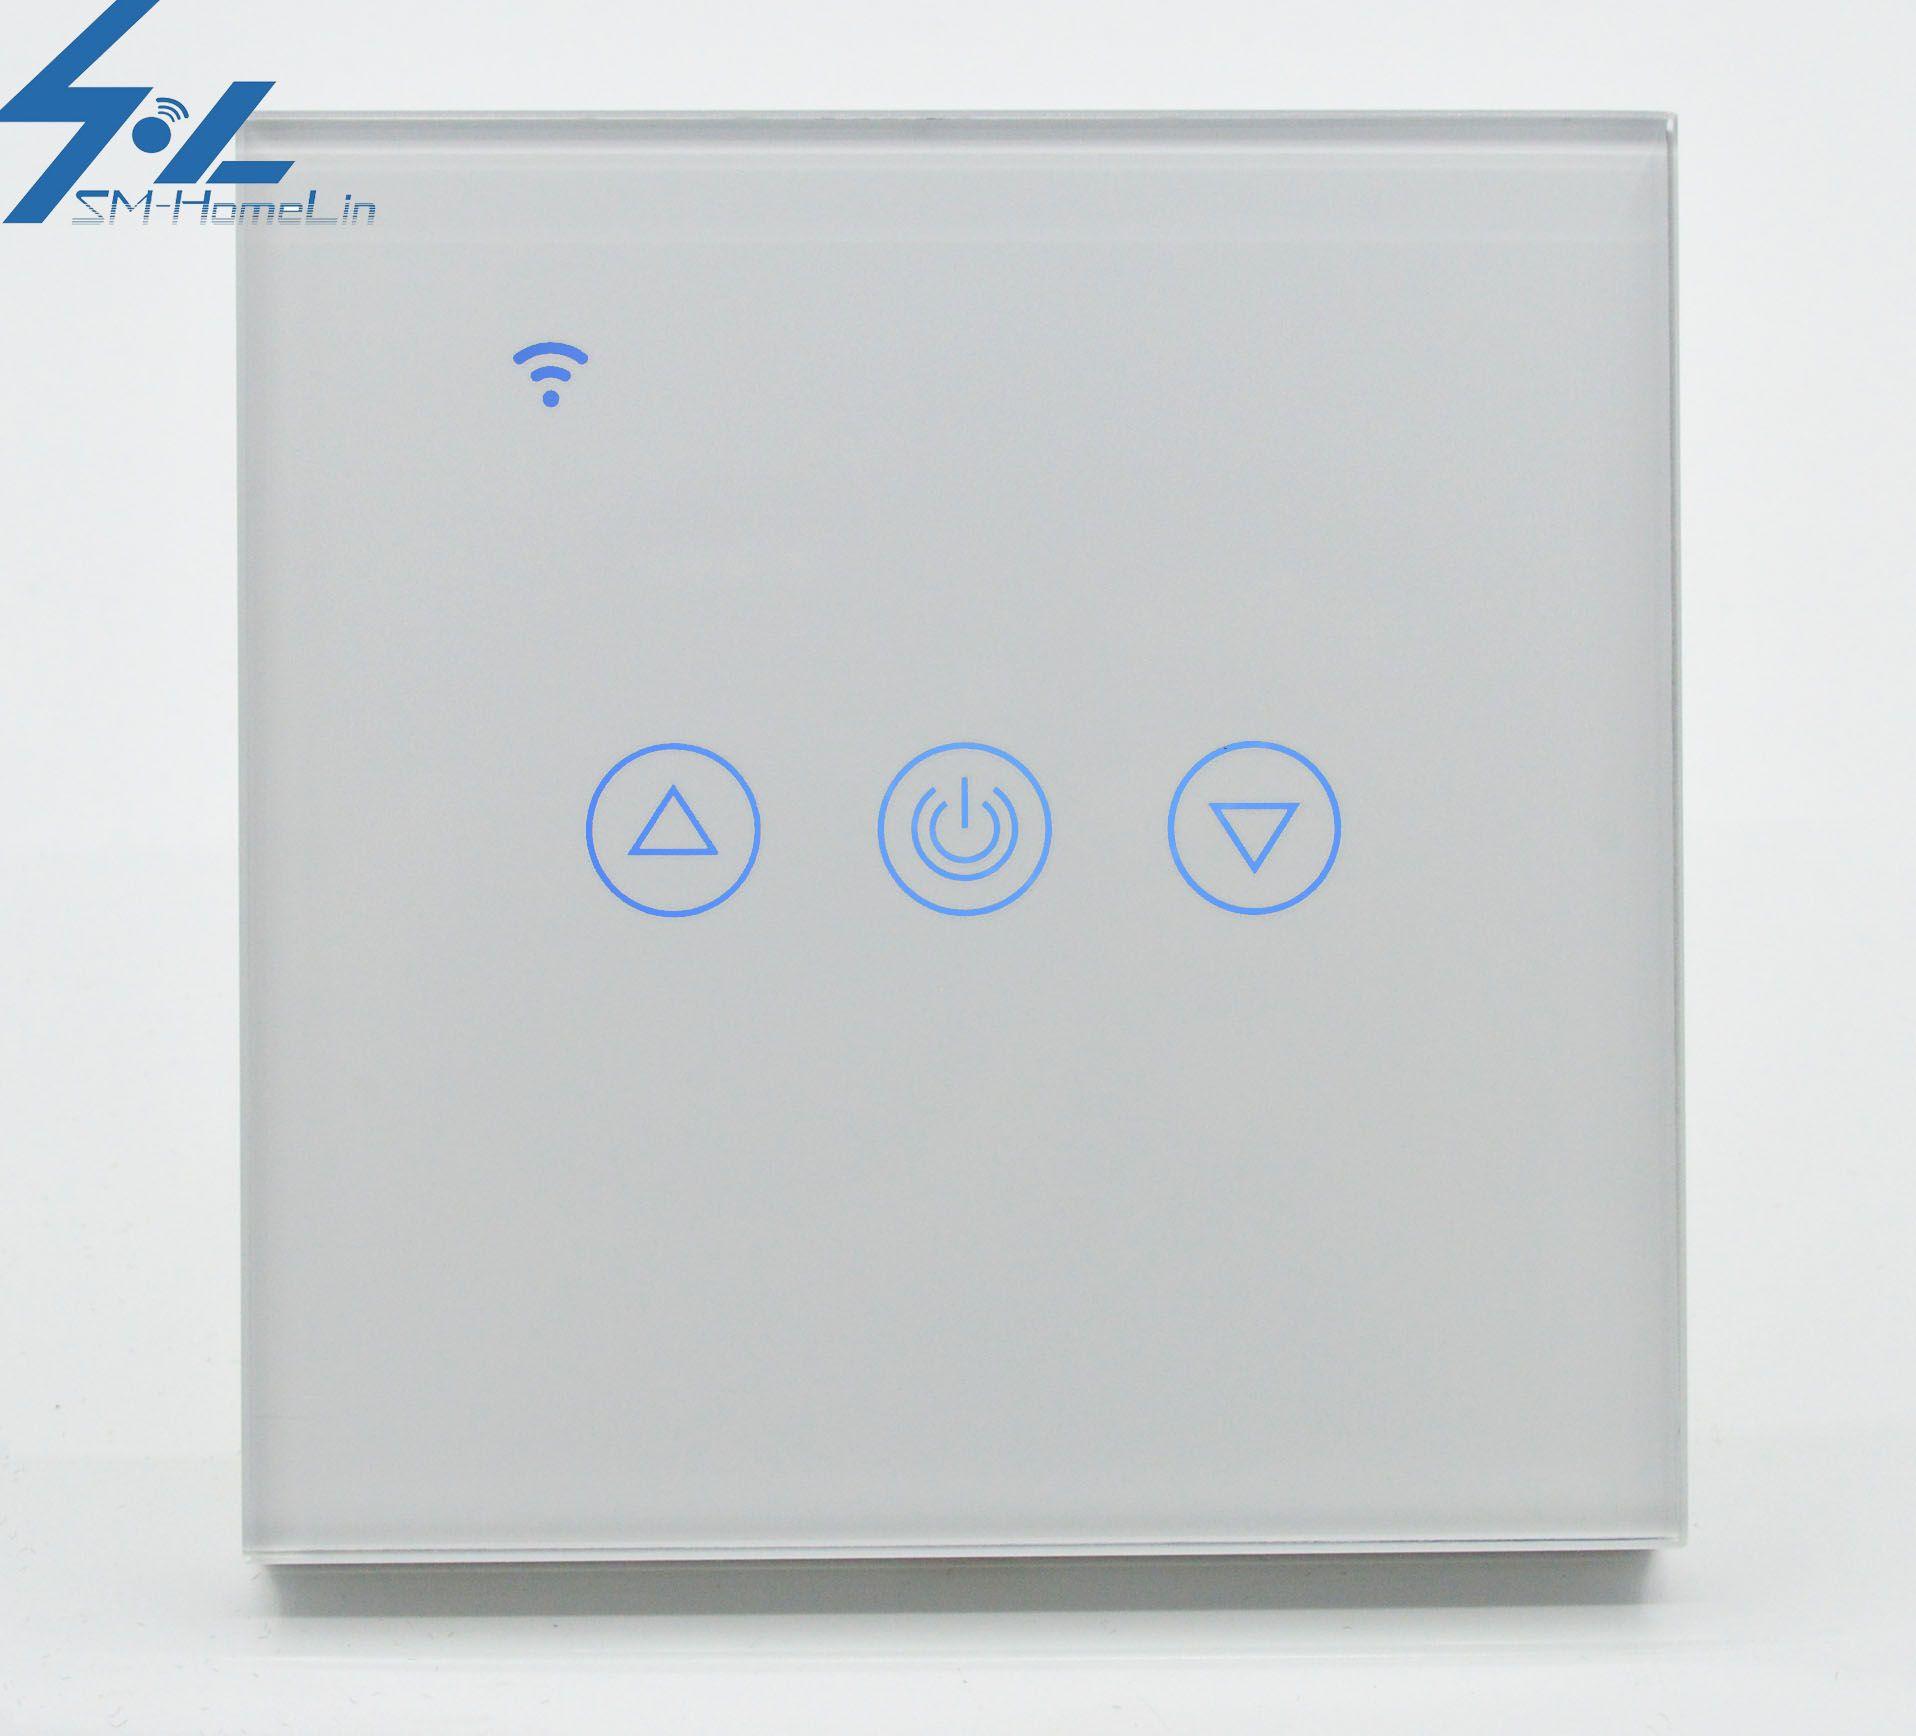 2018new Eu Dimmer Light Switch Smart Touch Switch Intelligent Switch ...